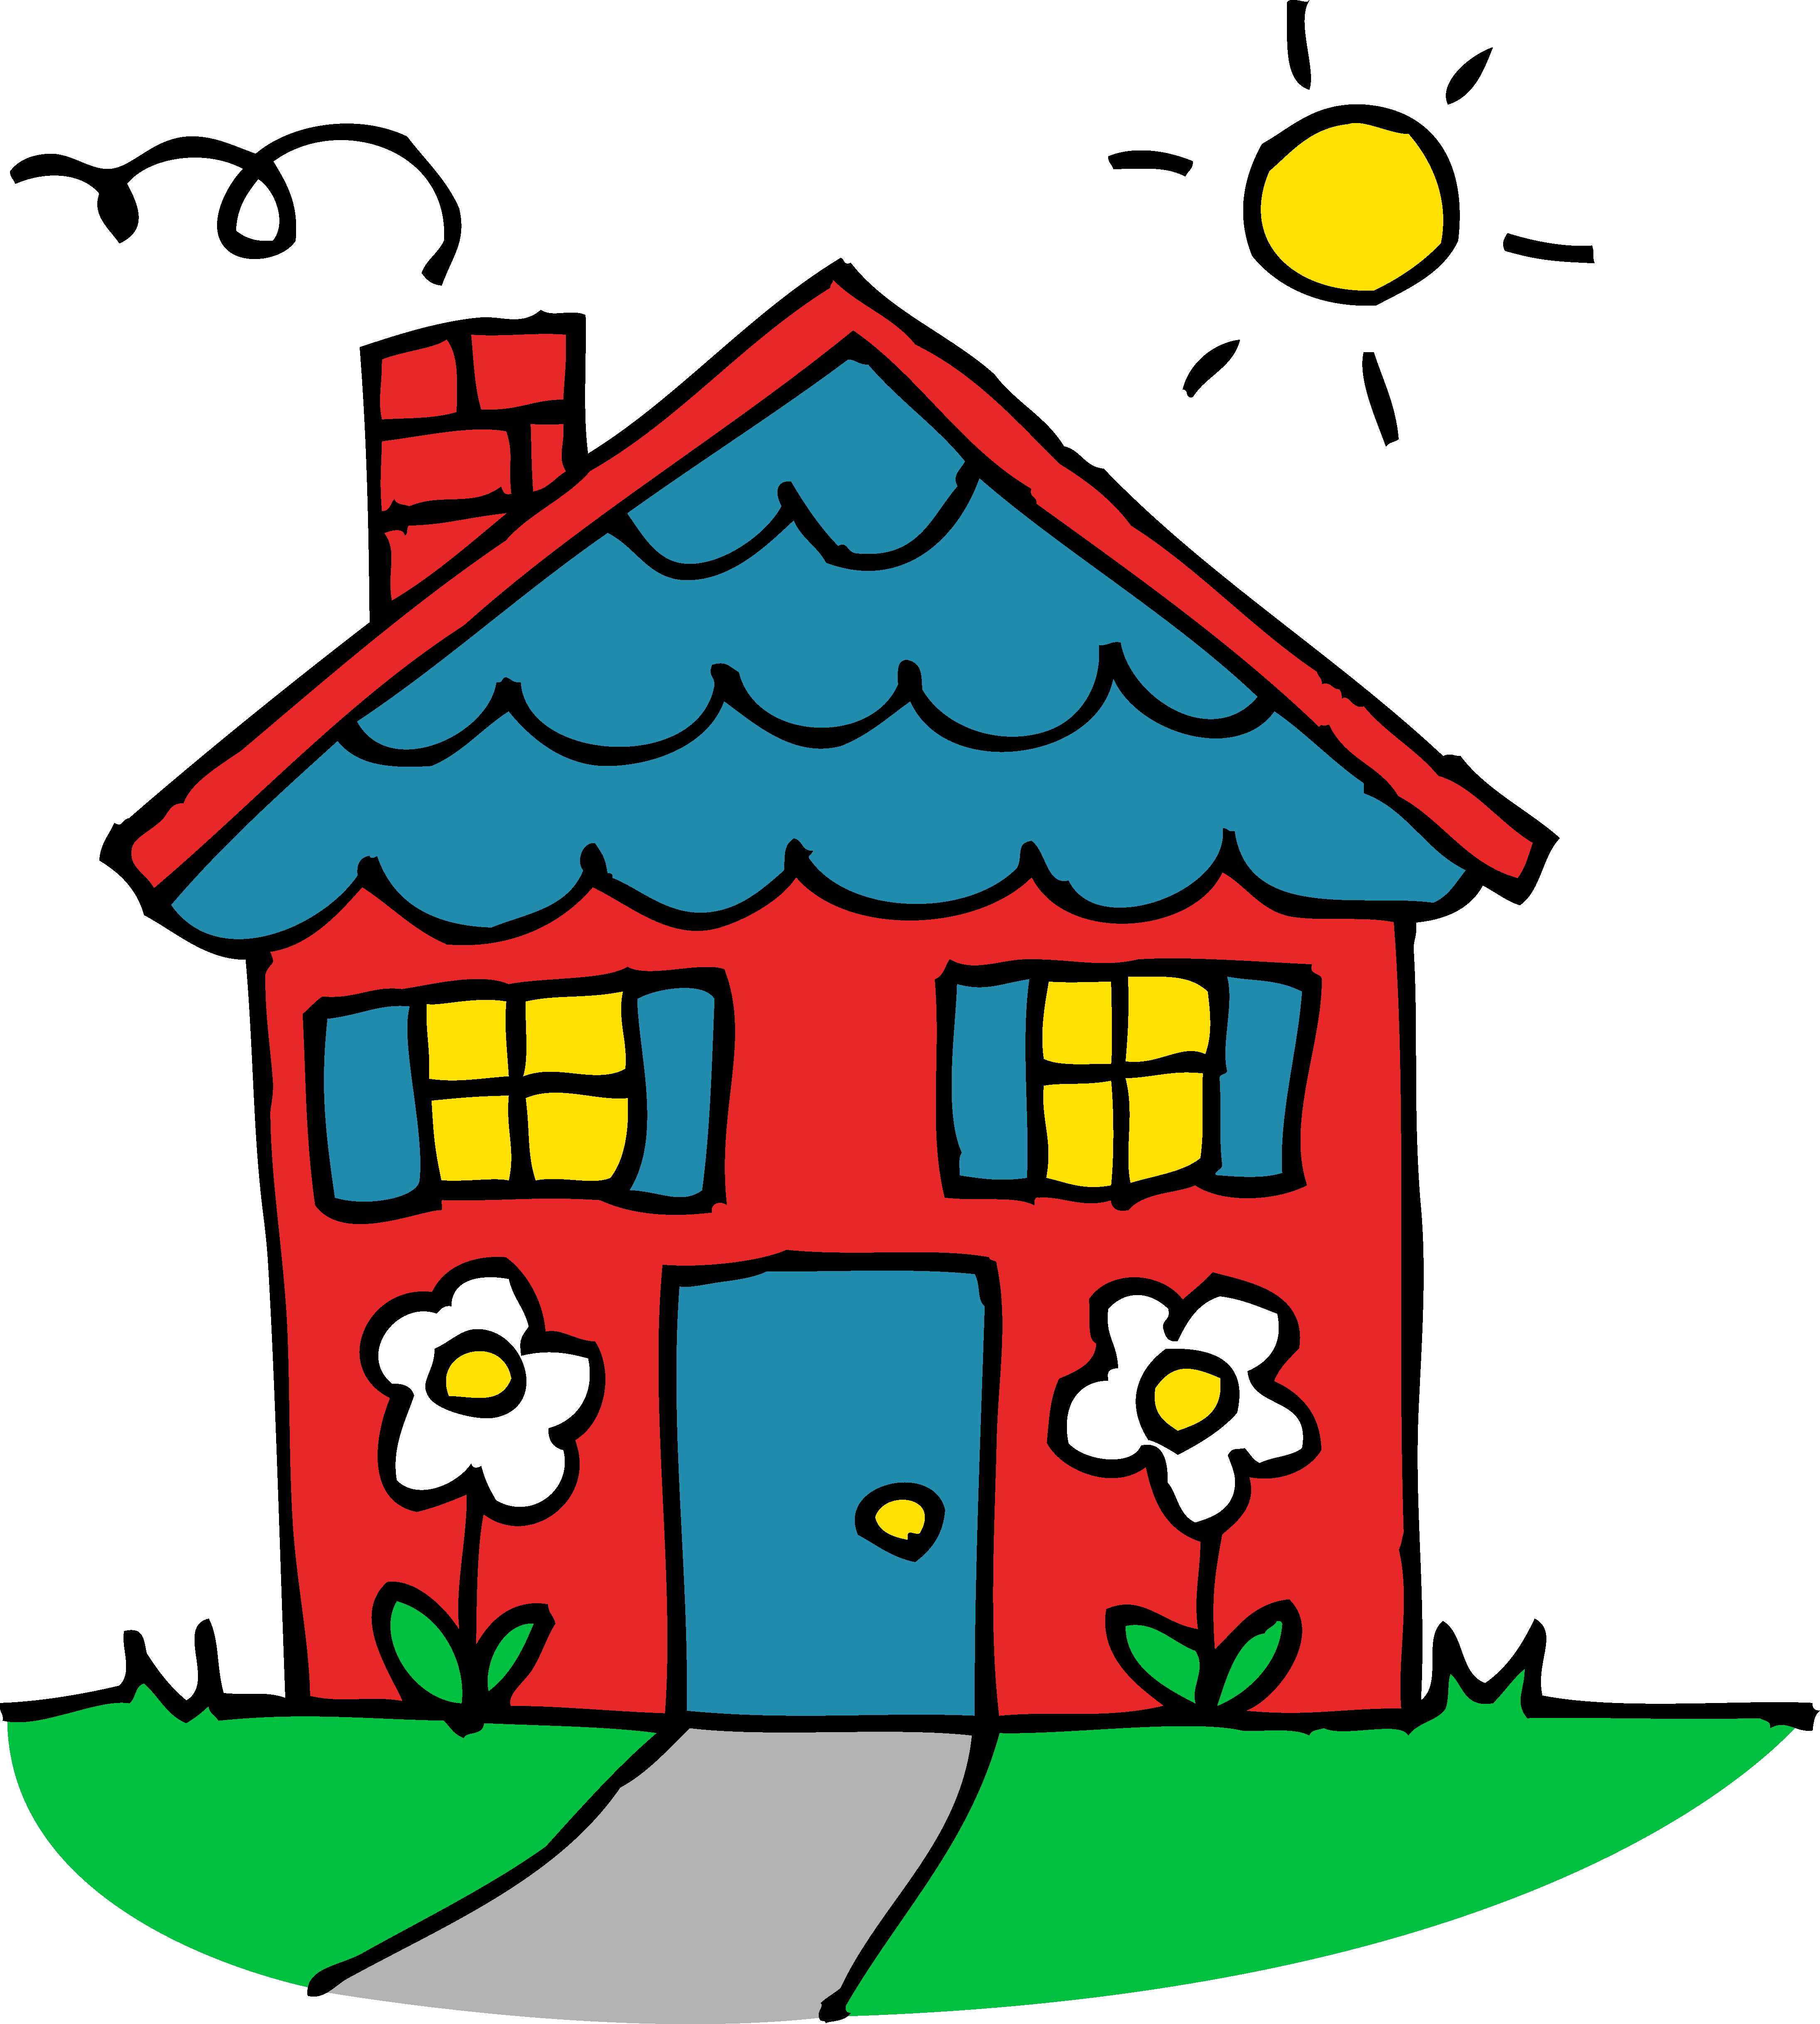 house clipart u0026middot; house clipart-house clipart u0026middot; house clipart-1